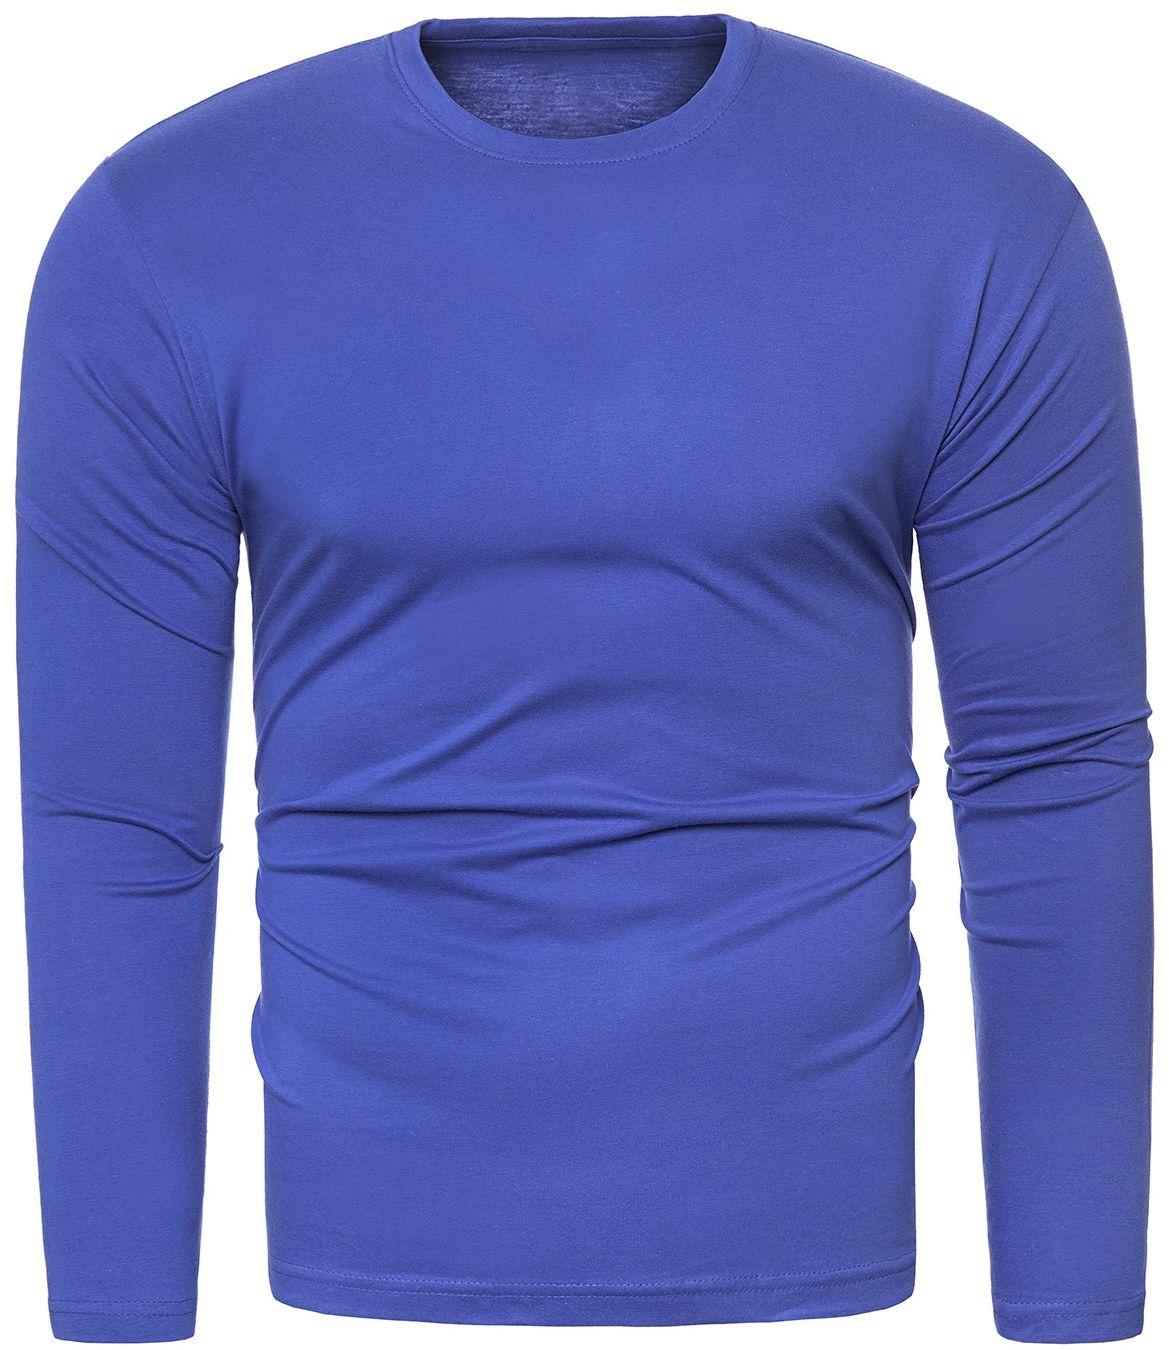 Bluza męska longsleeve N01L - indigo